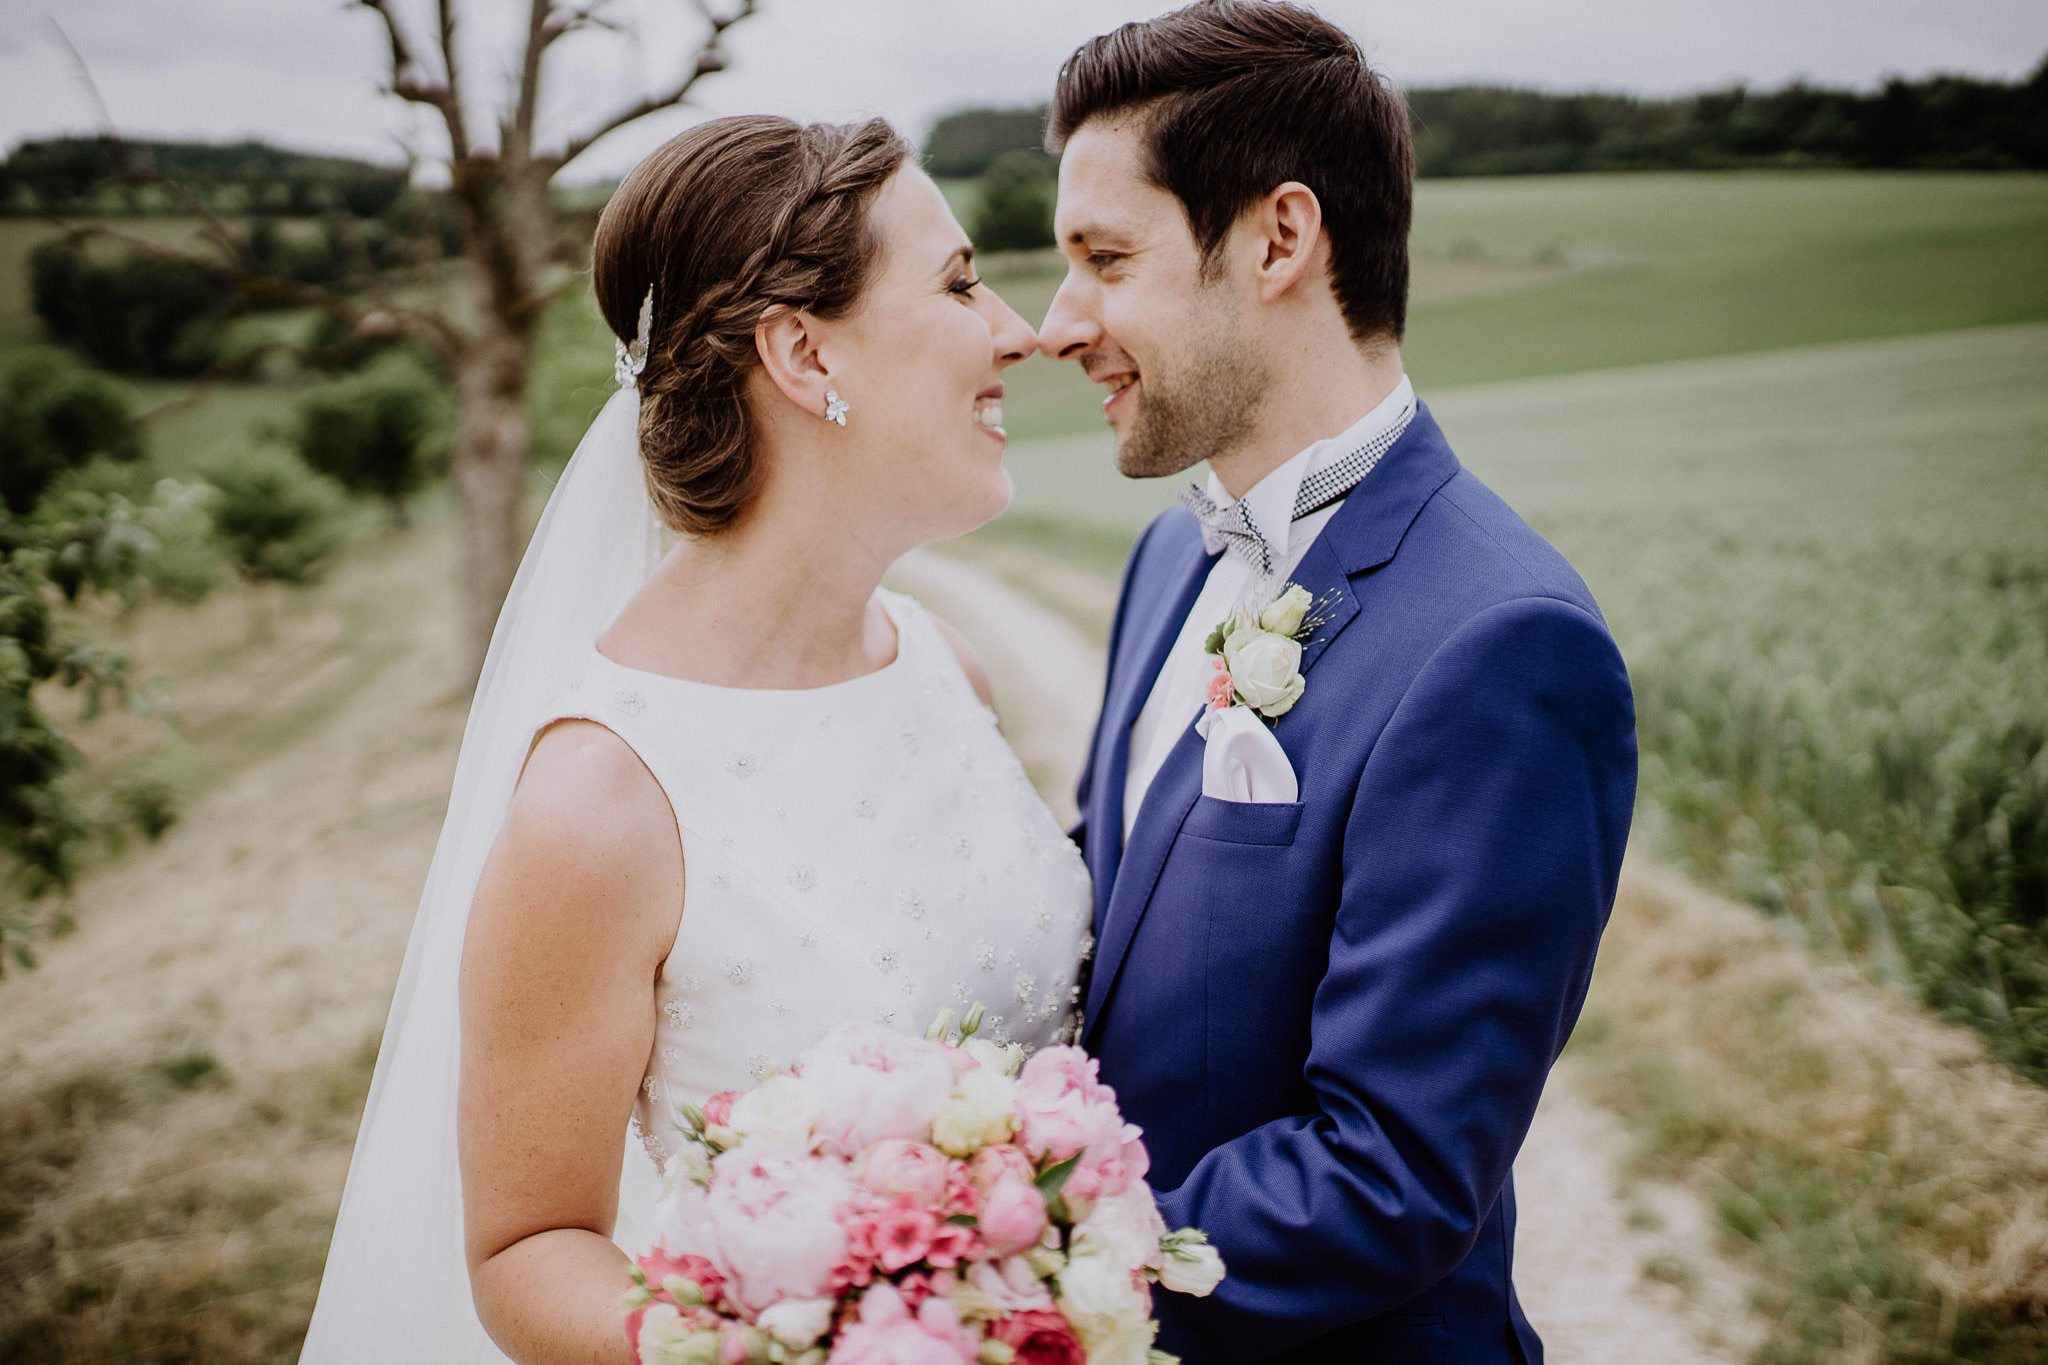 wedding photographer hamilton new zealand 1018 5